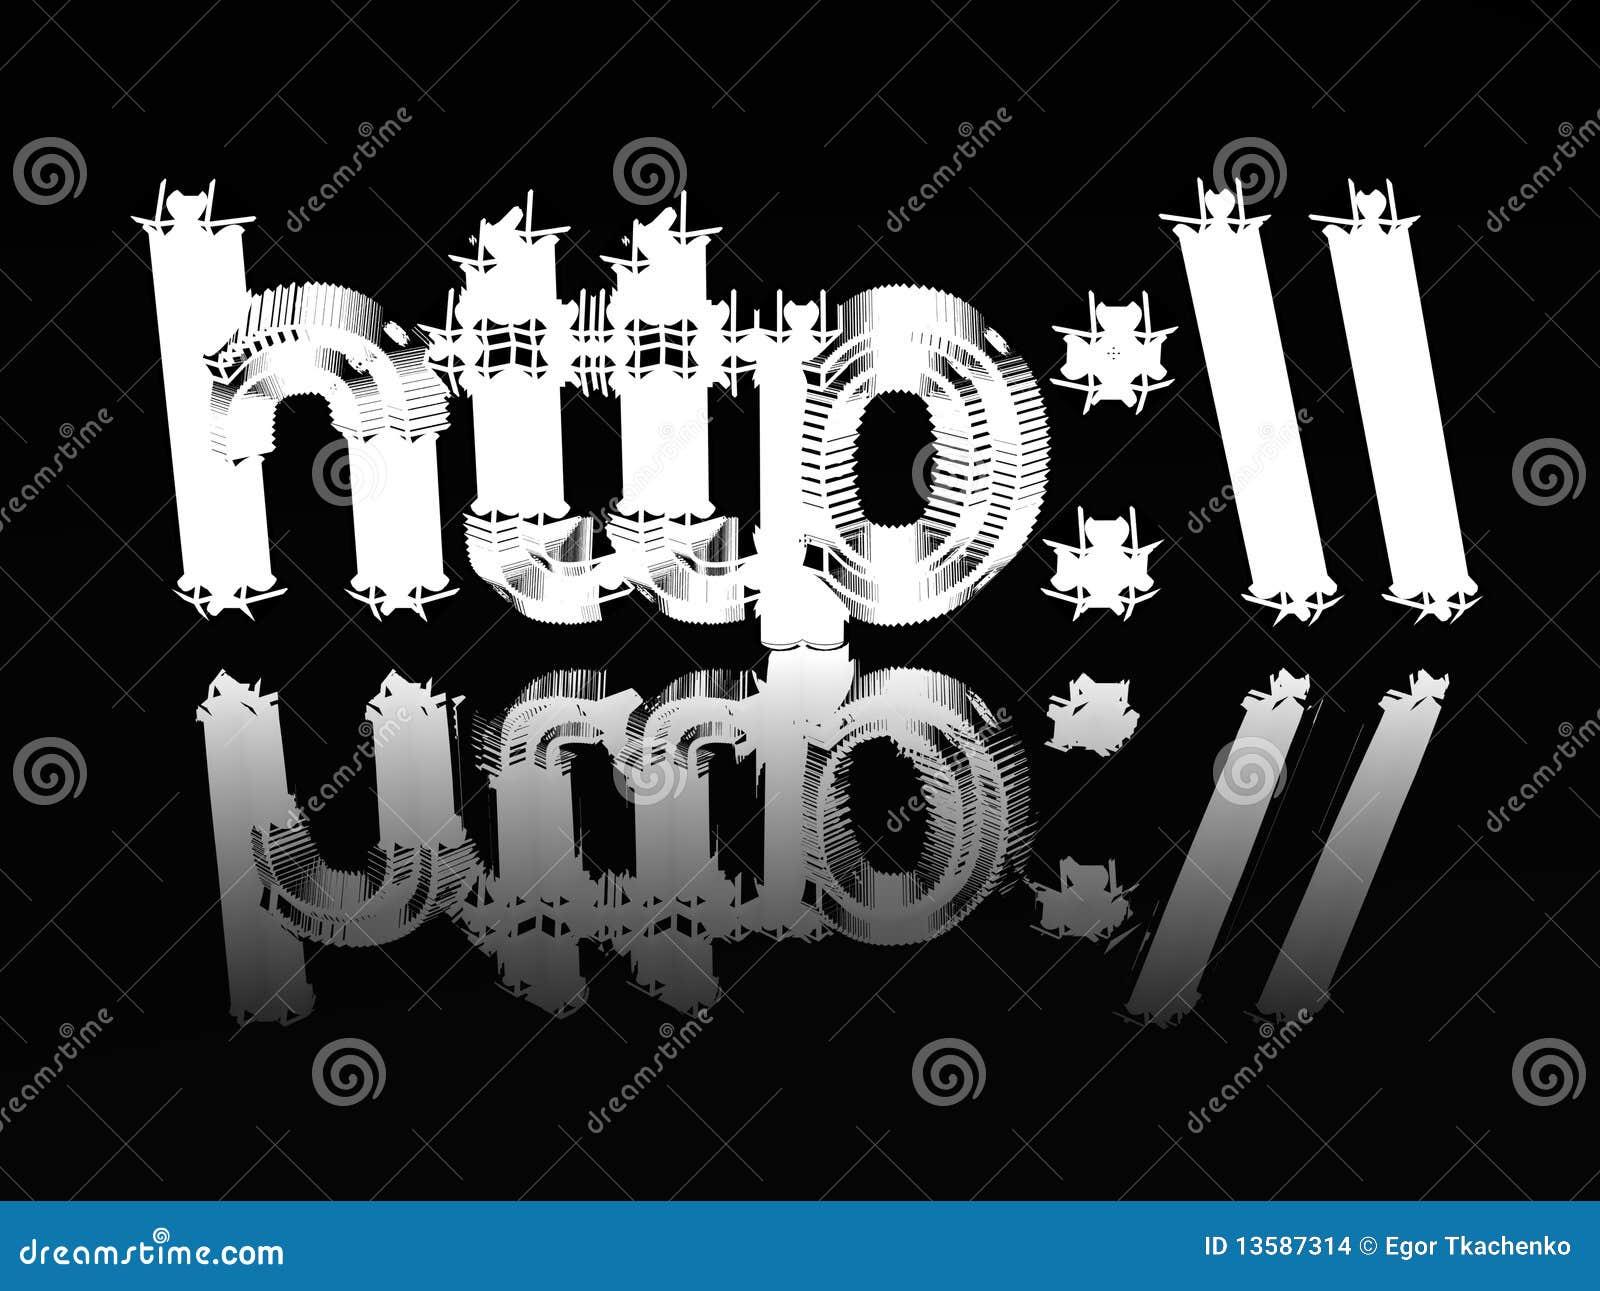 Text ?HTTP?.